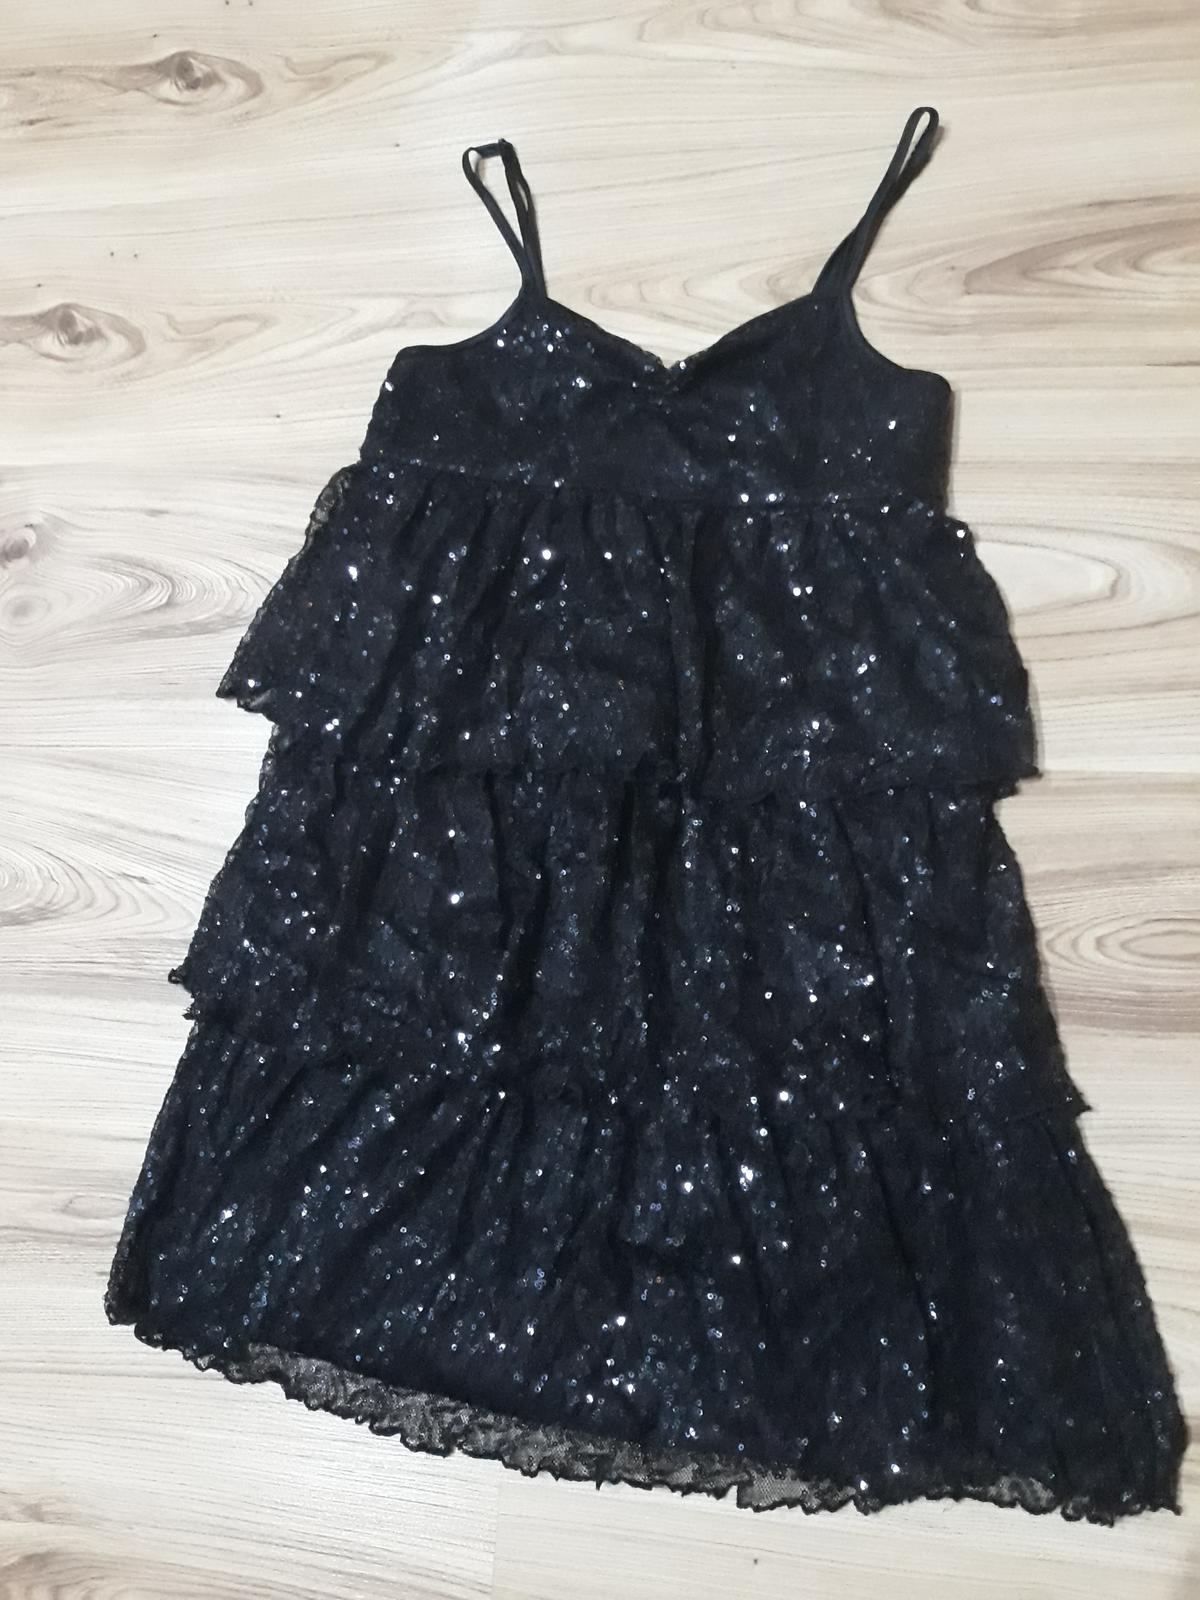 Flitrové šaty - Obrázok č. 1